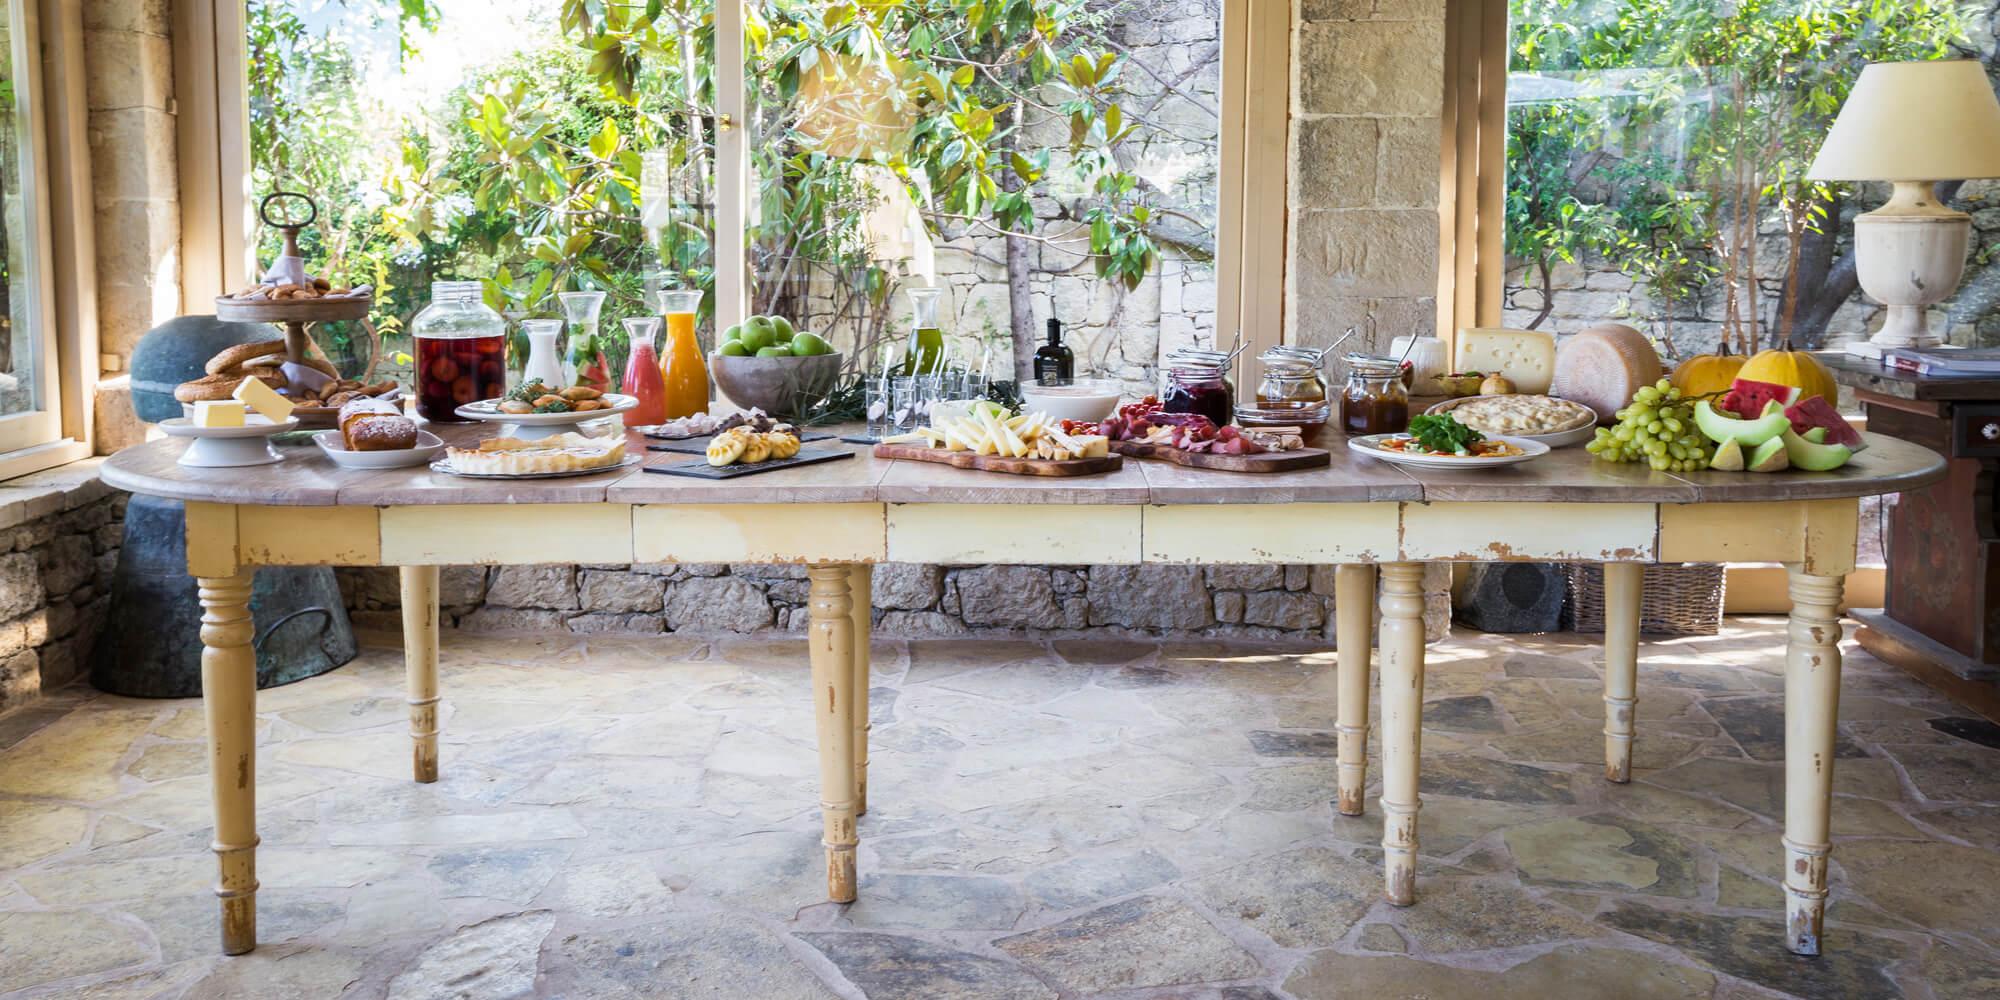 gedekte tafel vol eten